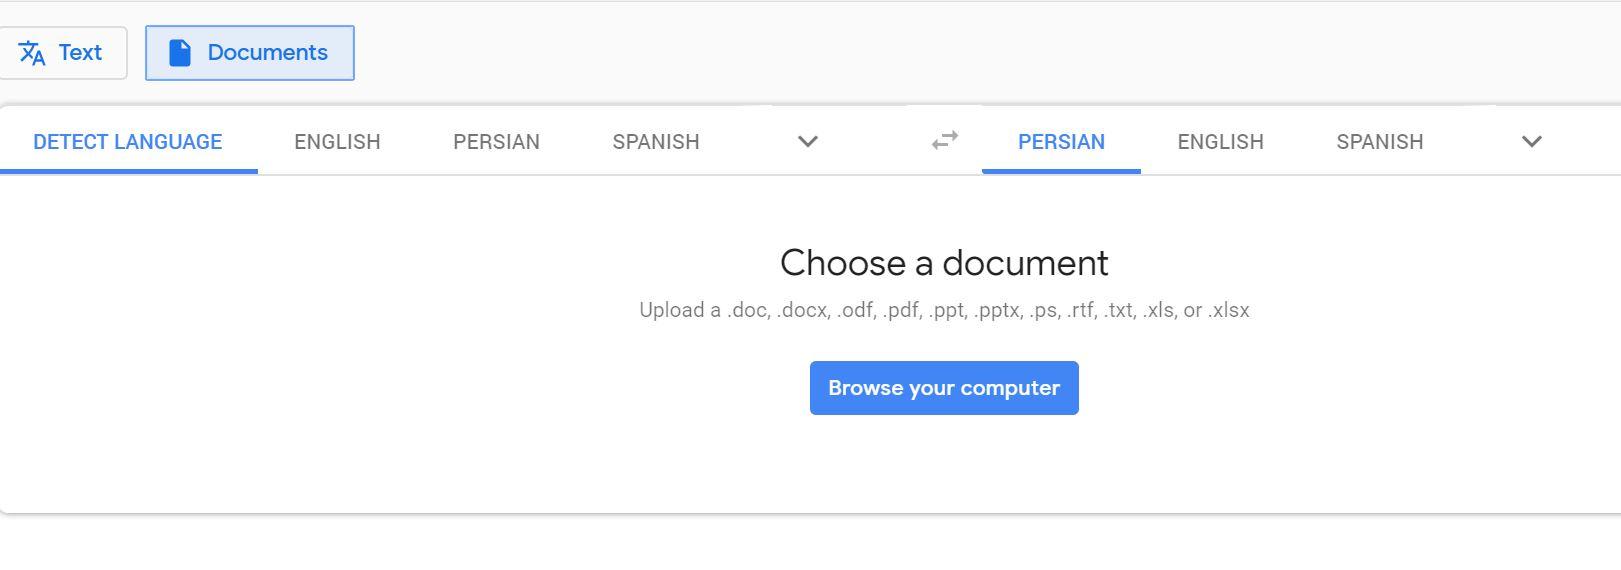 document translate- سند موردنظر برای ترجمه